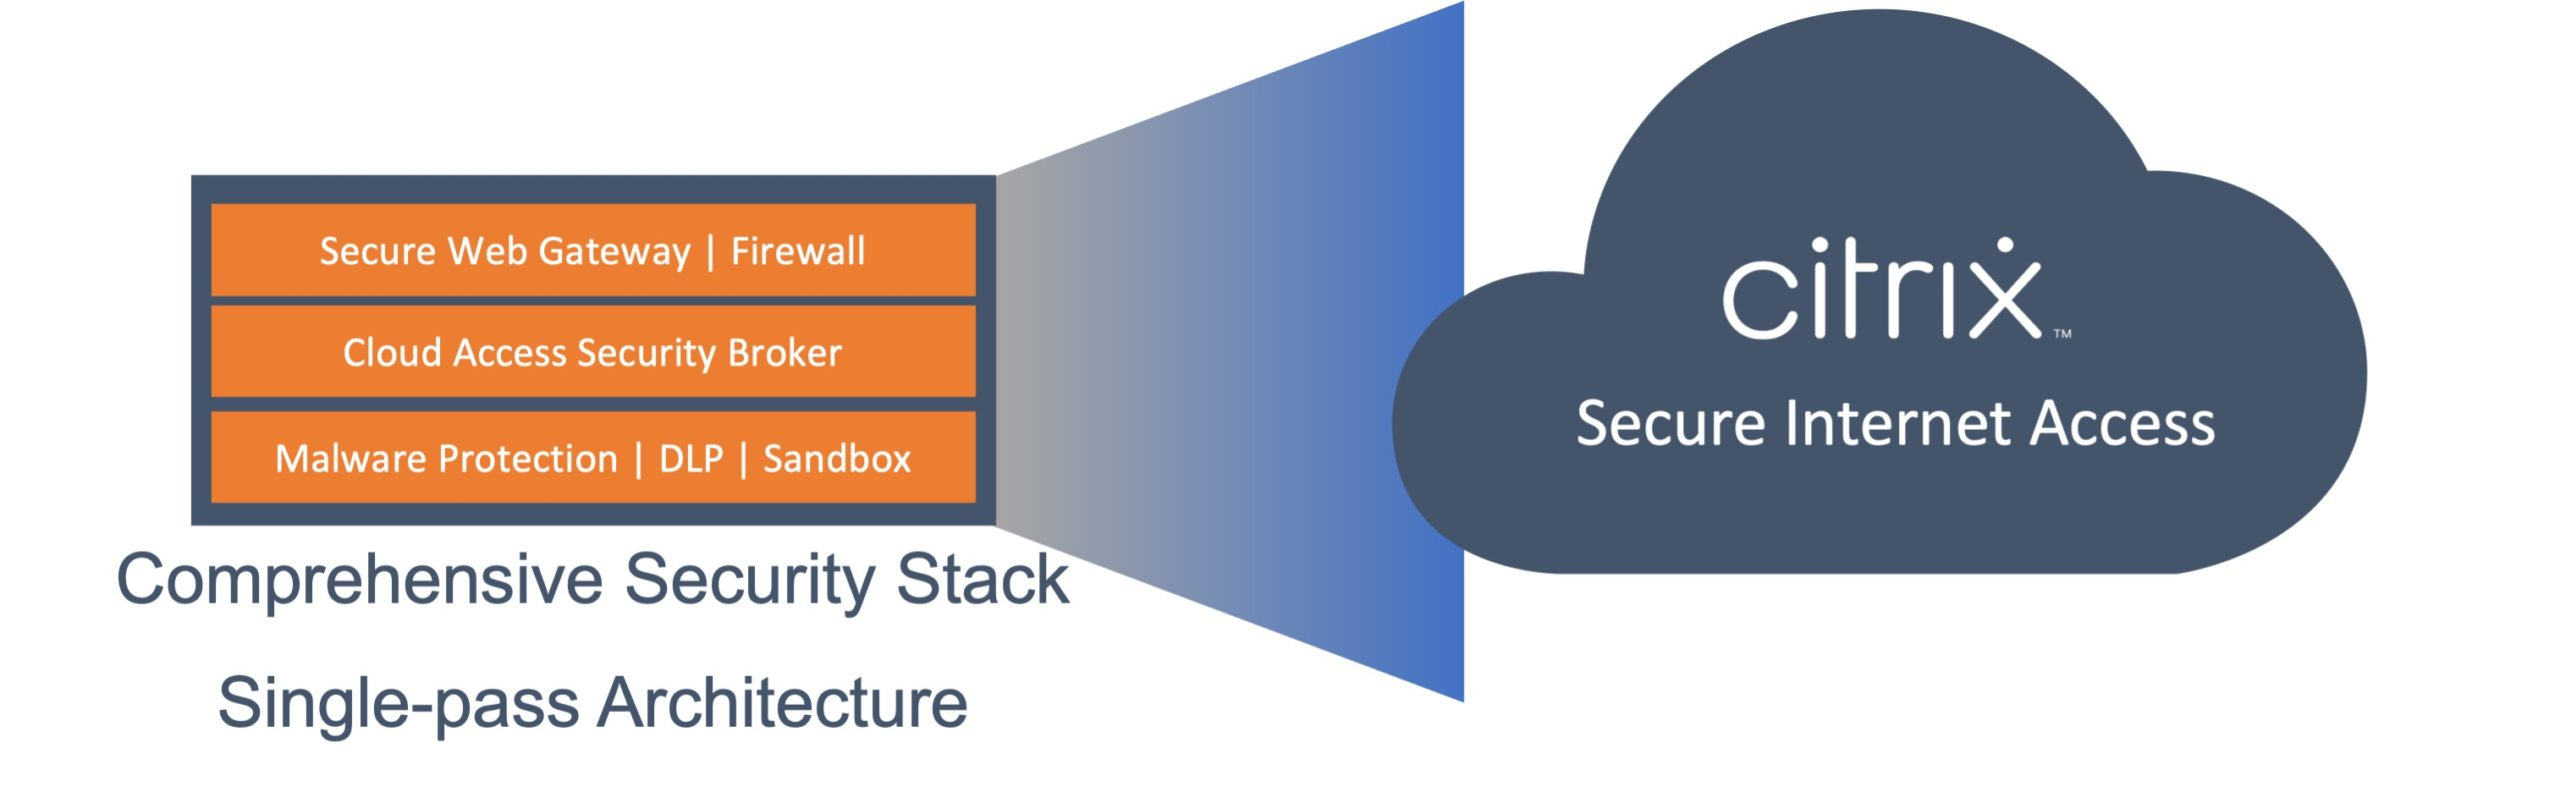 Citrix Secure Internet Access SPA